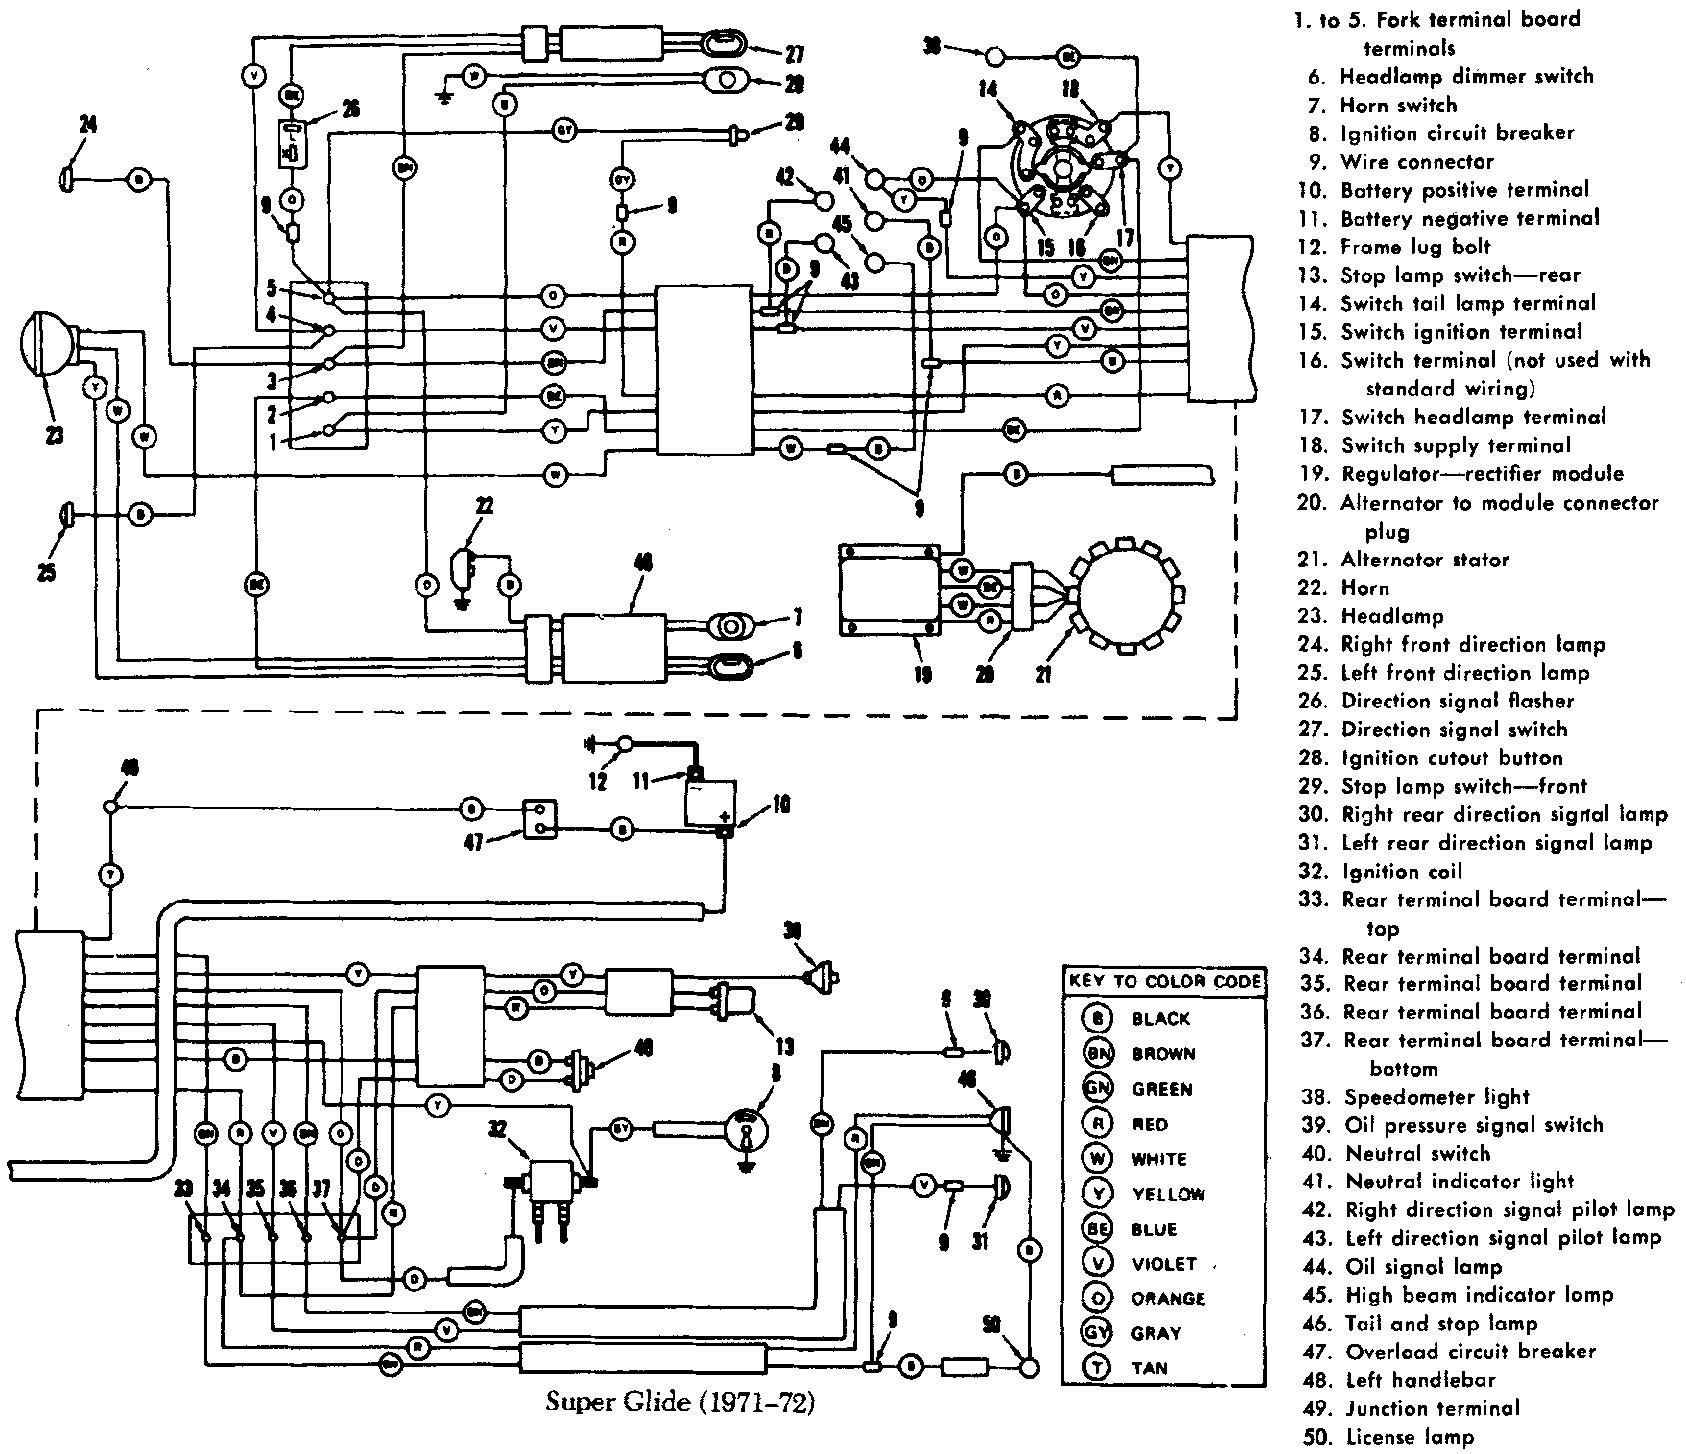 harley davidson 1976 flh wiring diagram